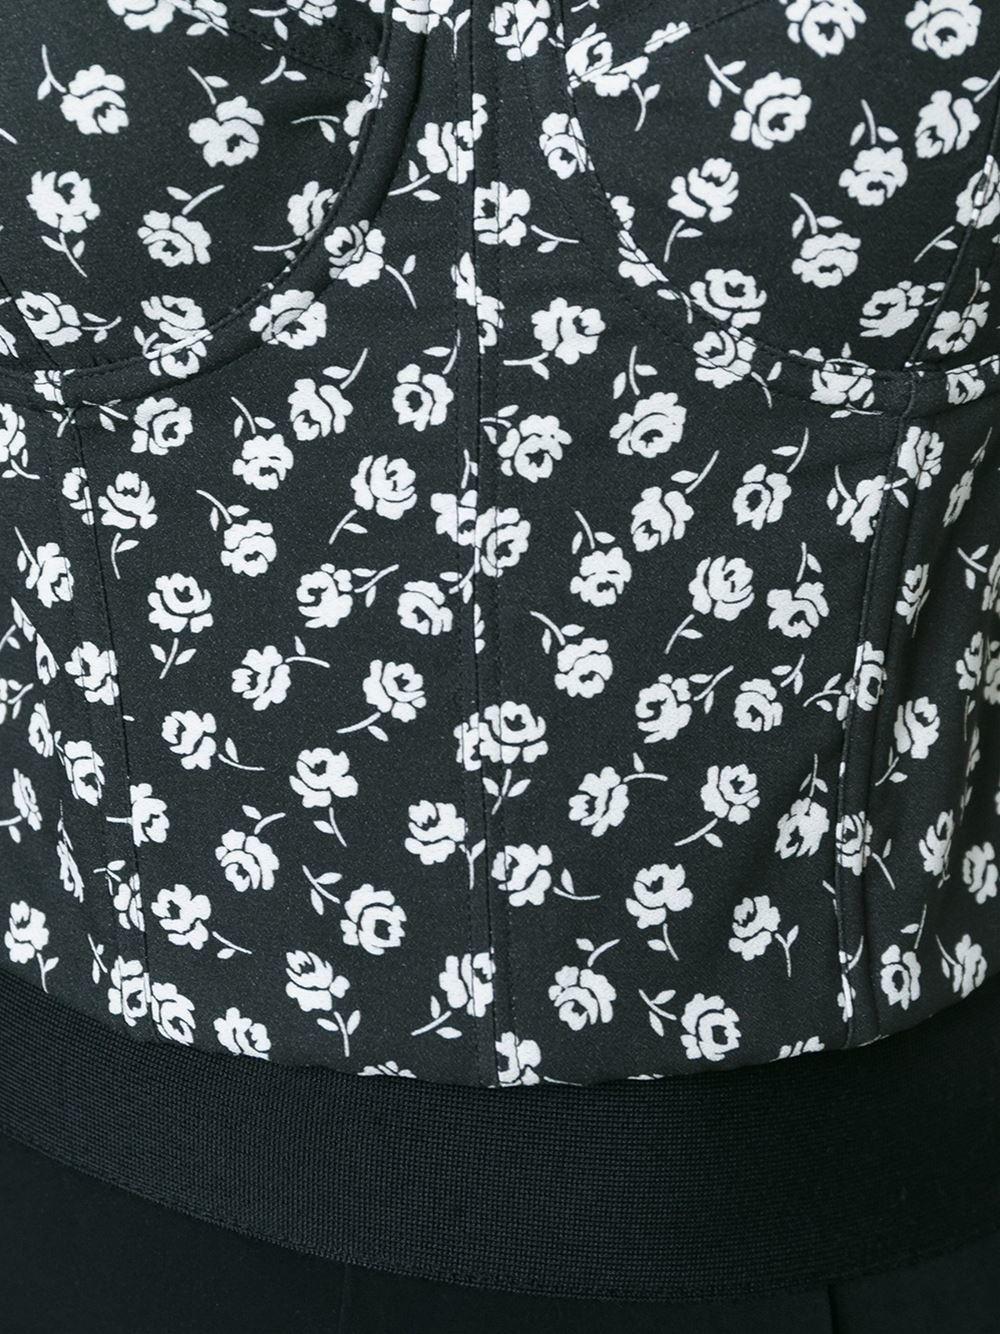 Dolce & Gabbana Floral Print Corset Top in Black